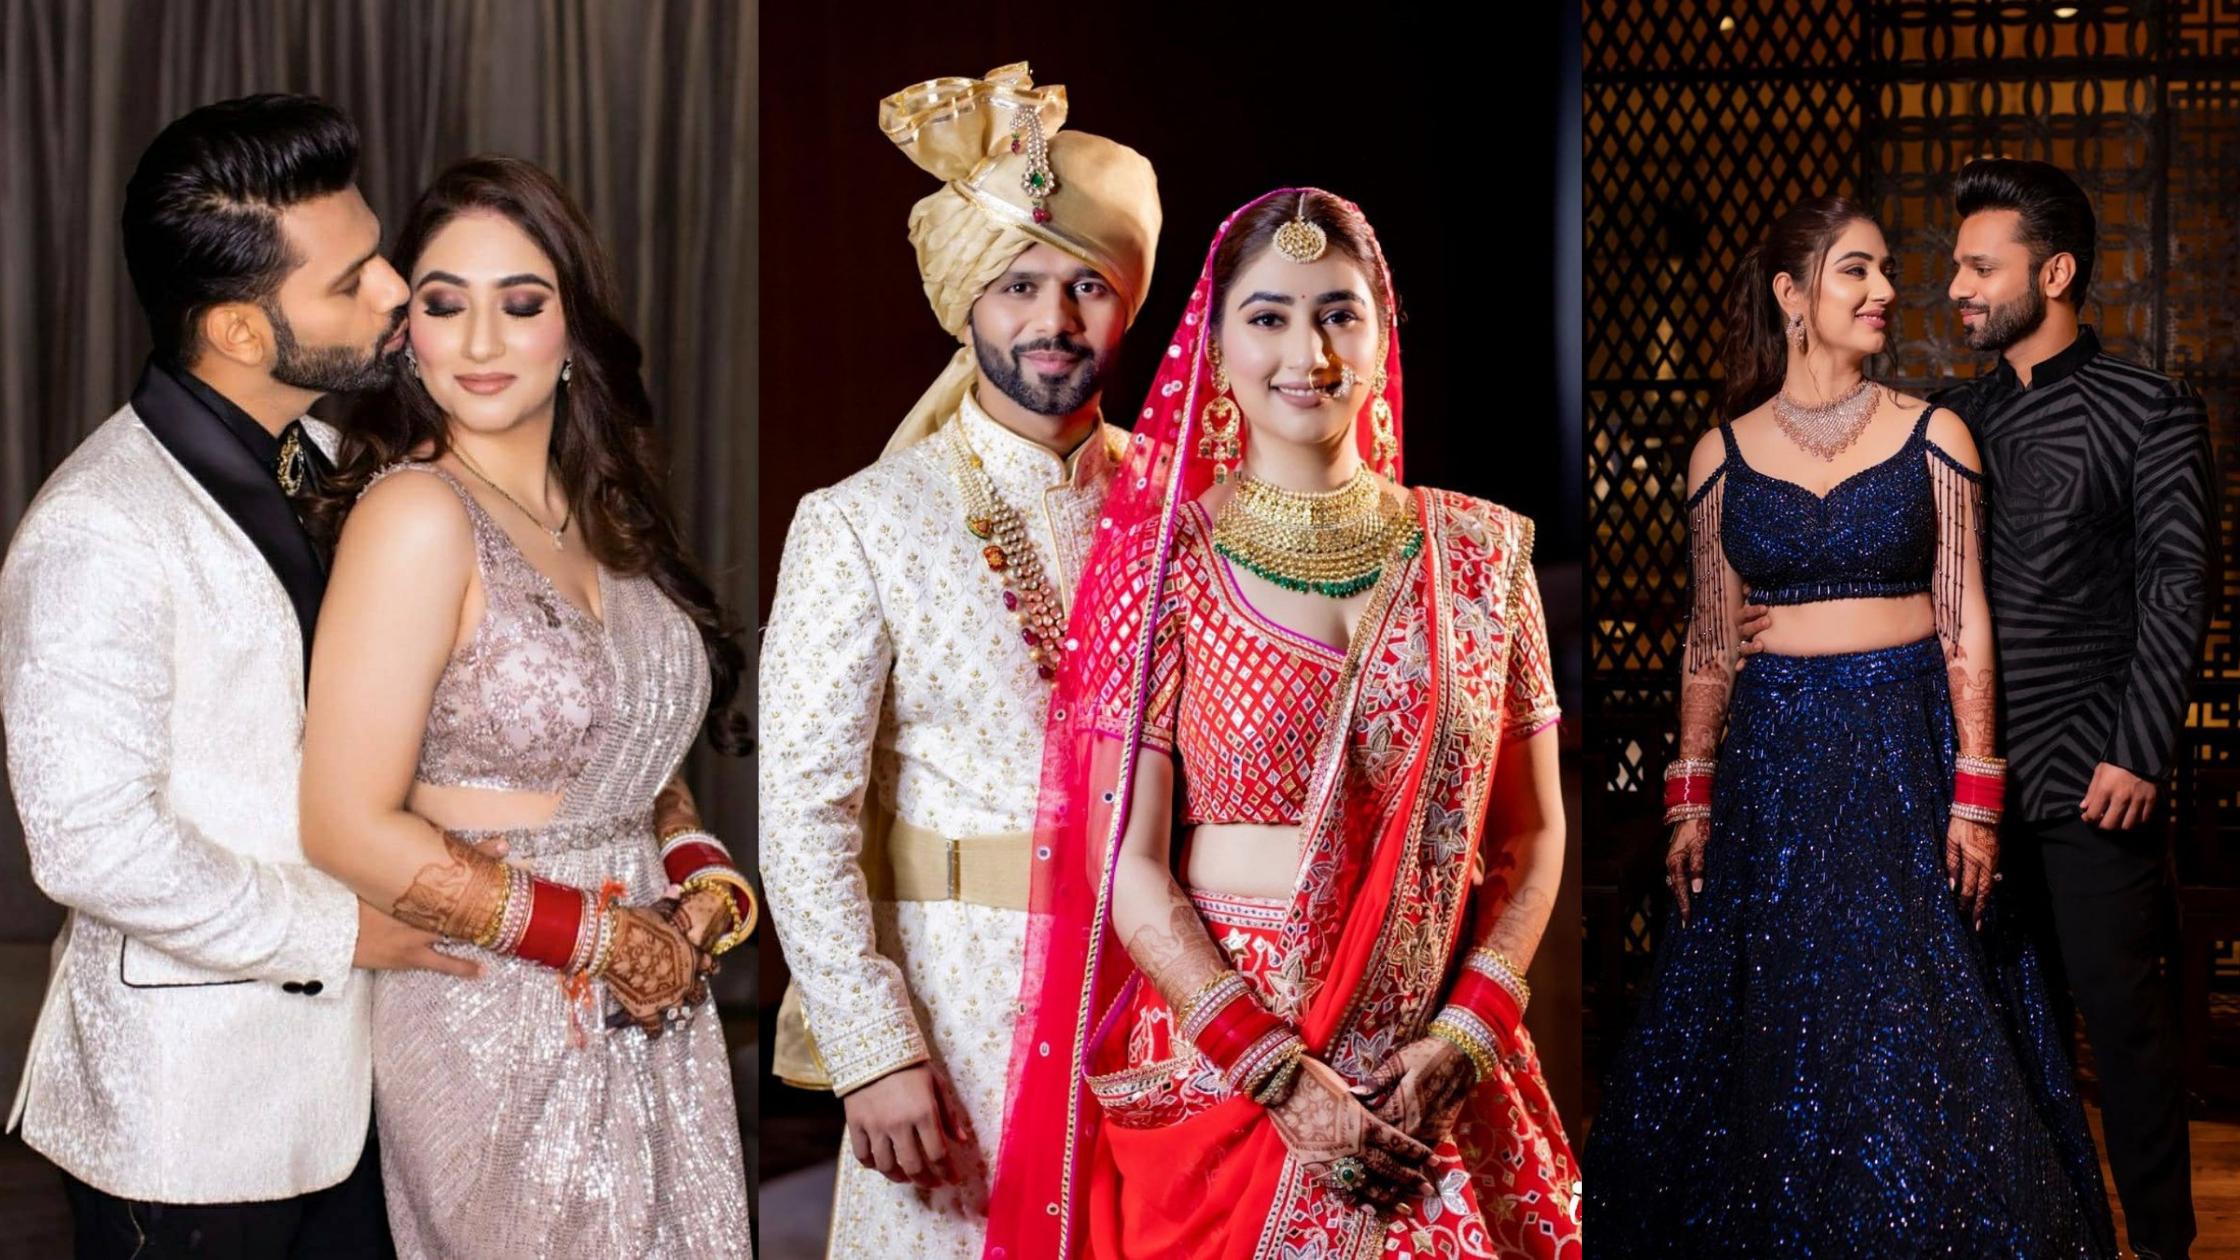 Rahul Vaidya & Disha Parmar wedding